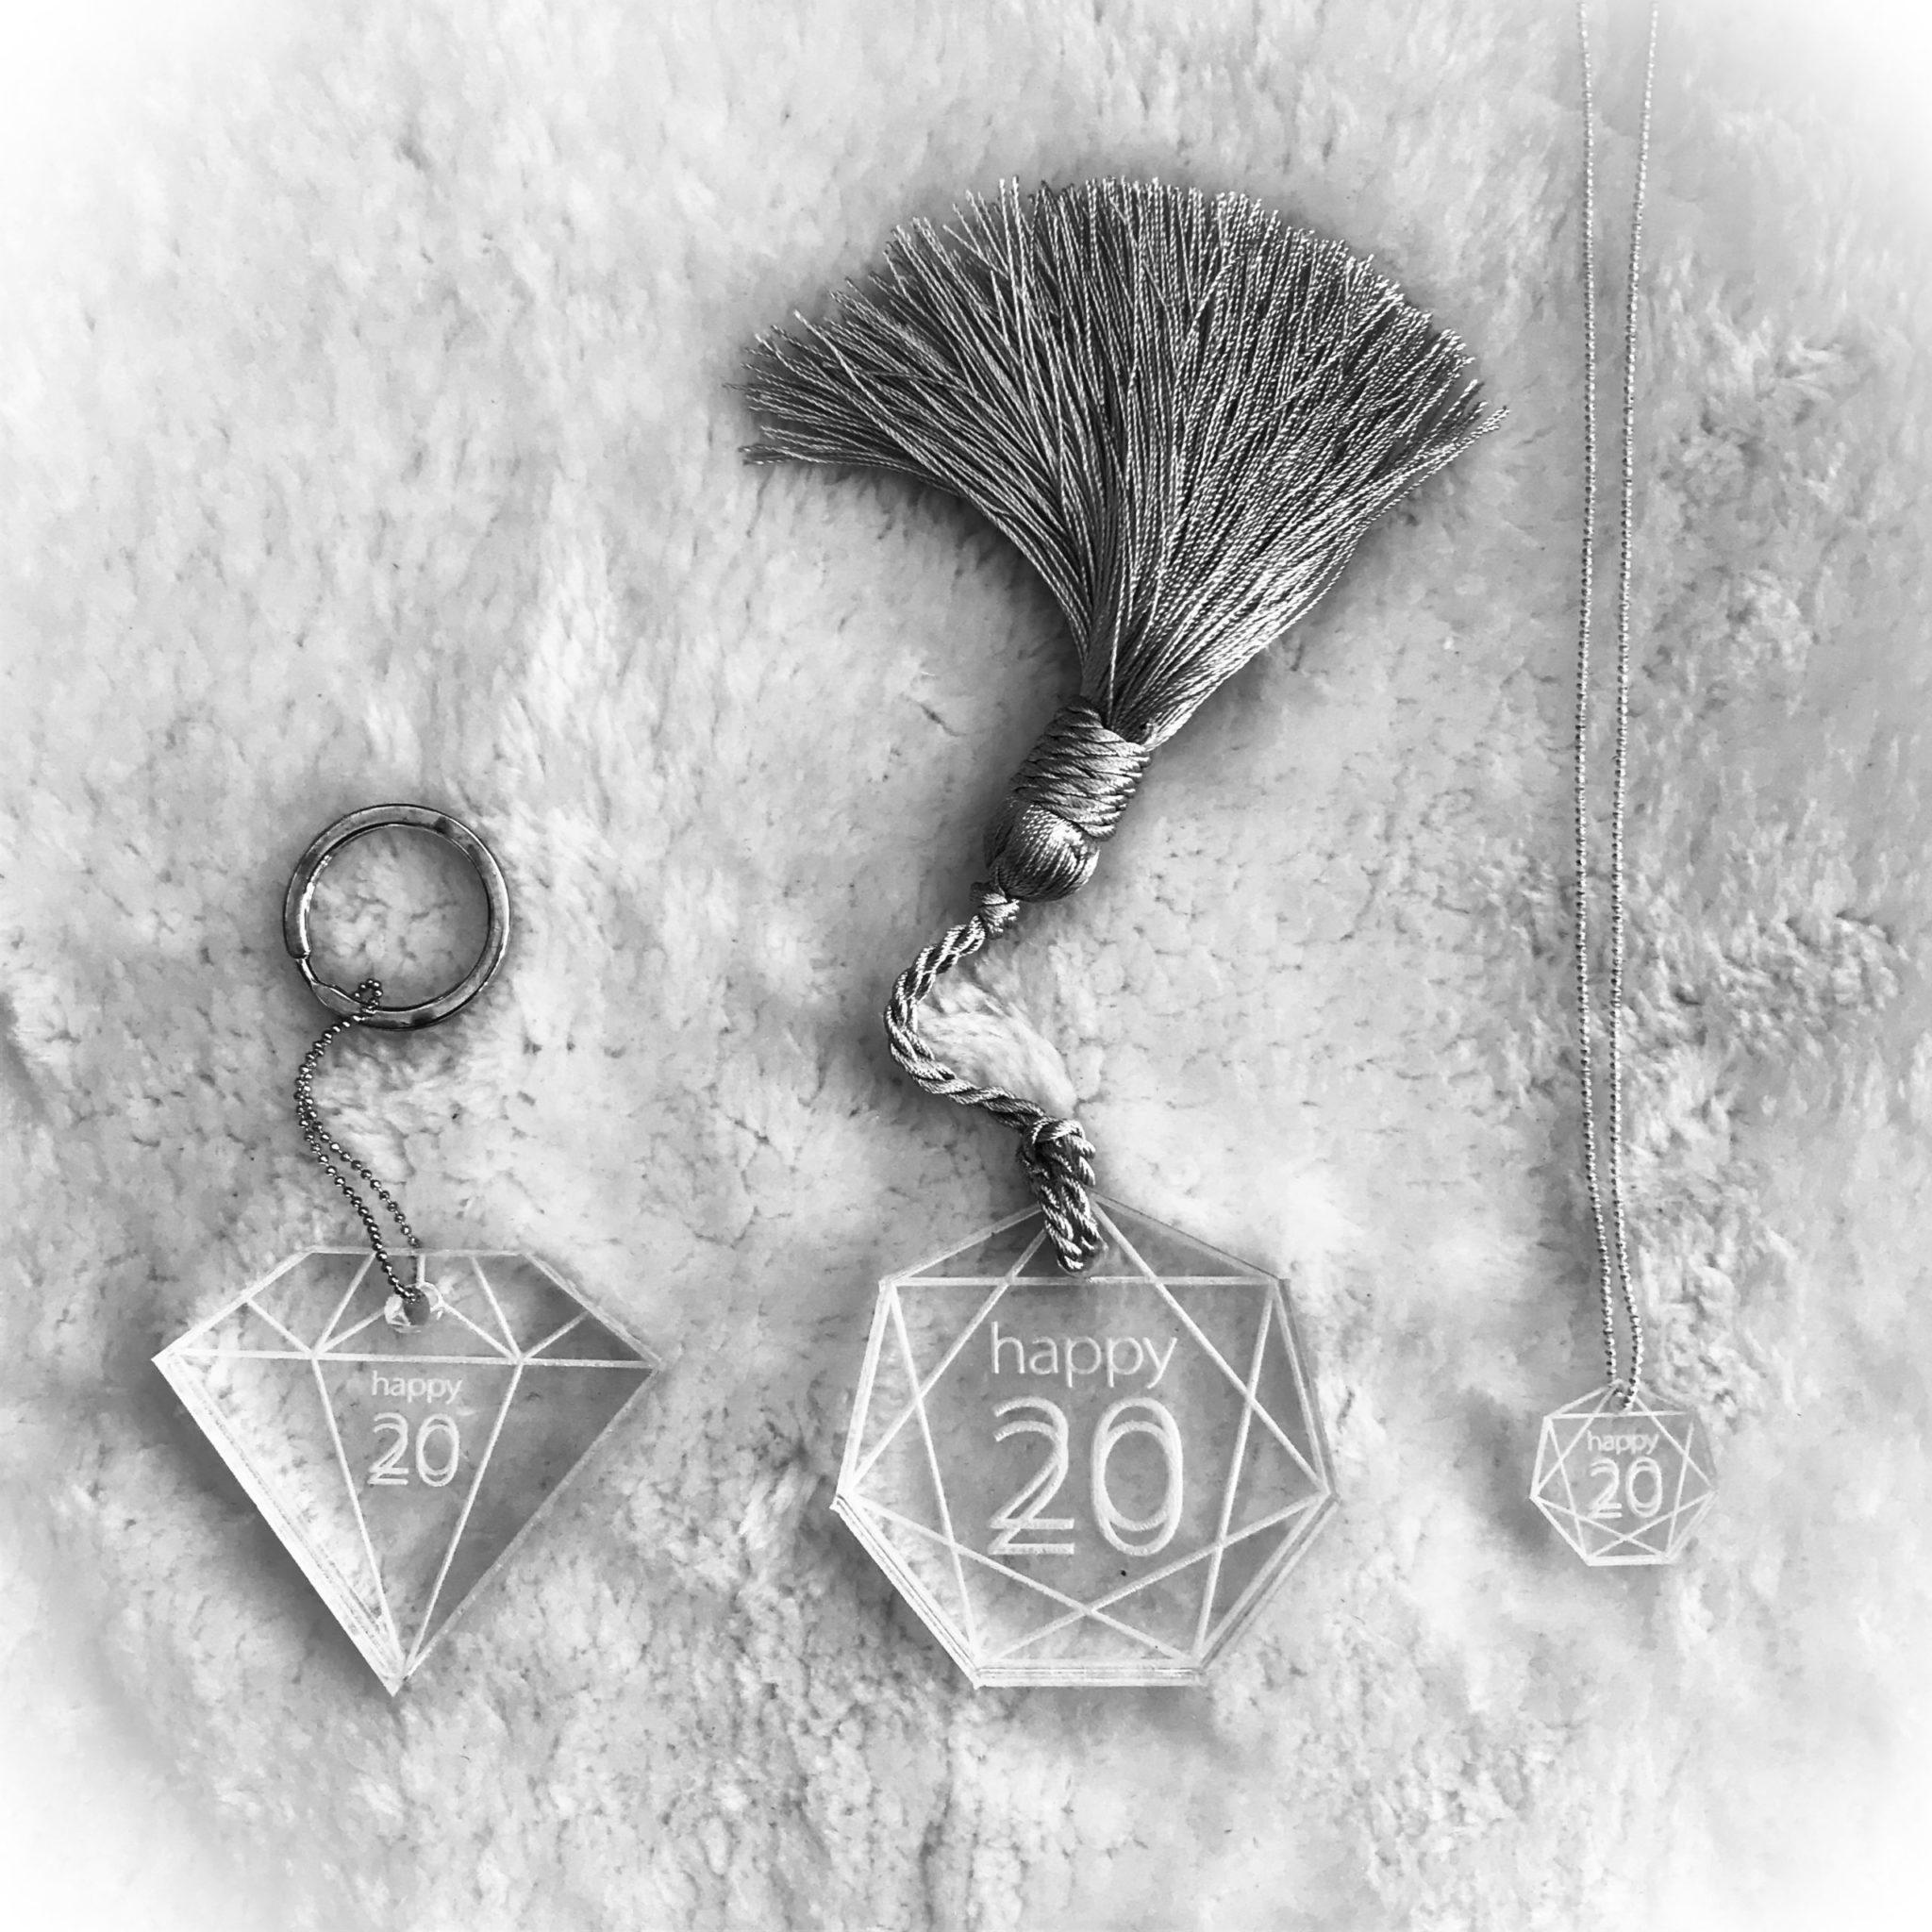 2020 Shine Bright Like A Diamond-special occasion-three versions